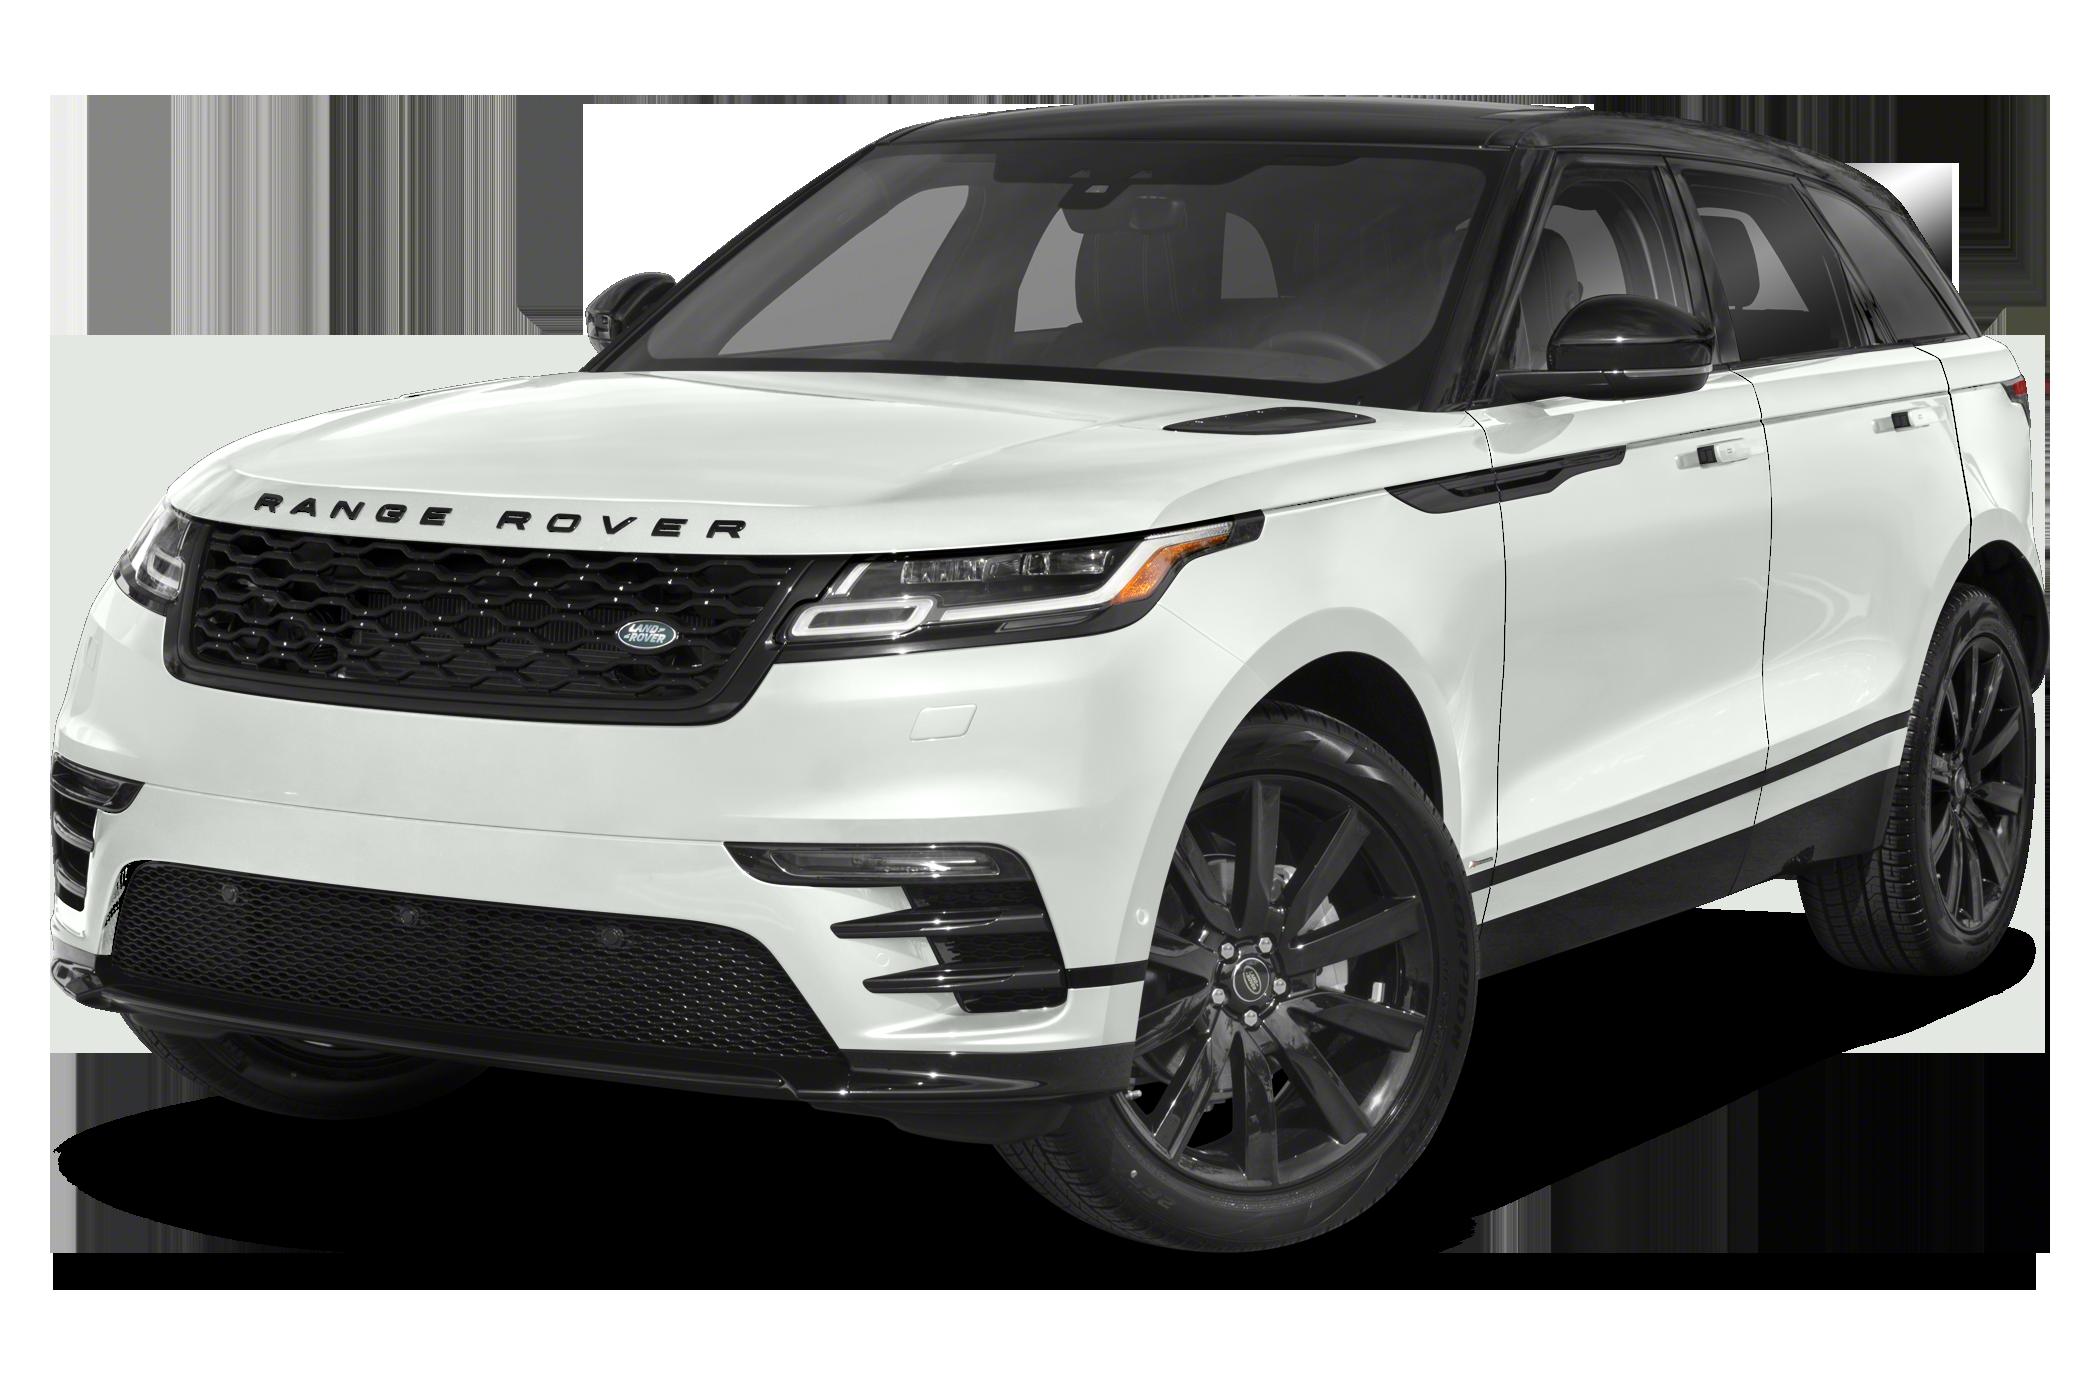 Compare Land Rover Range Rover Velar To Land Rover Range